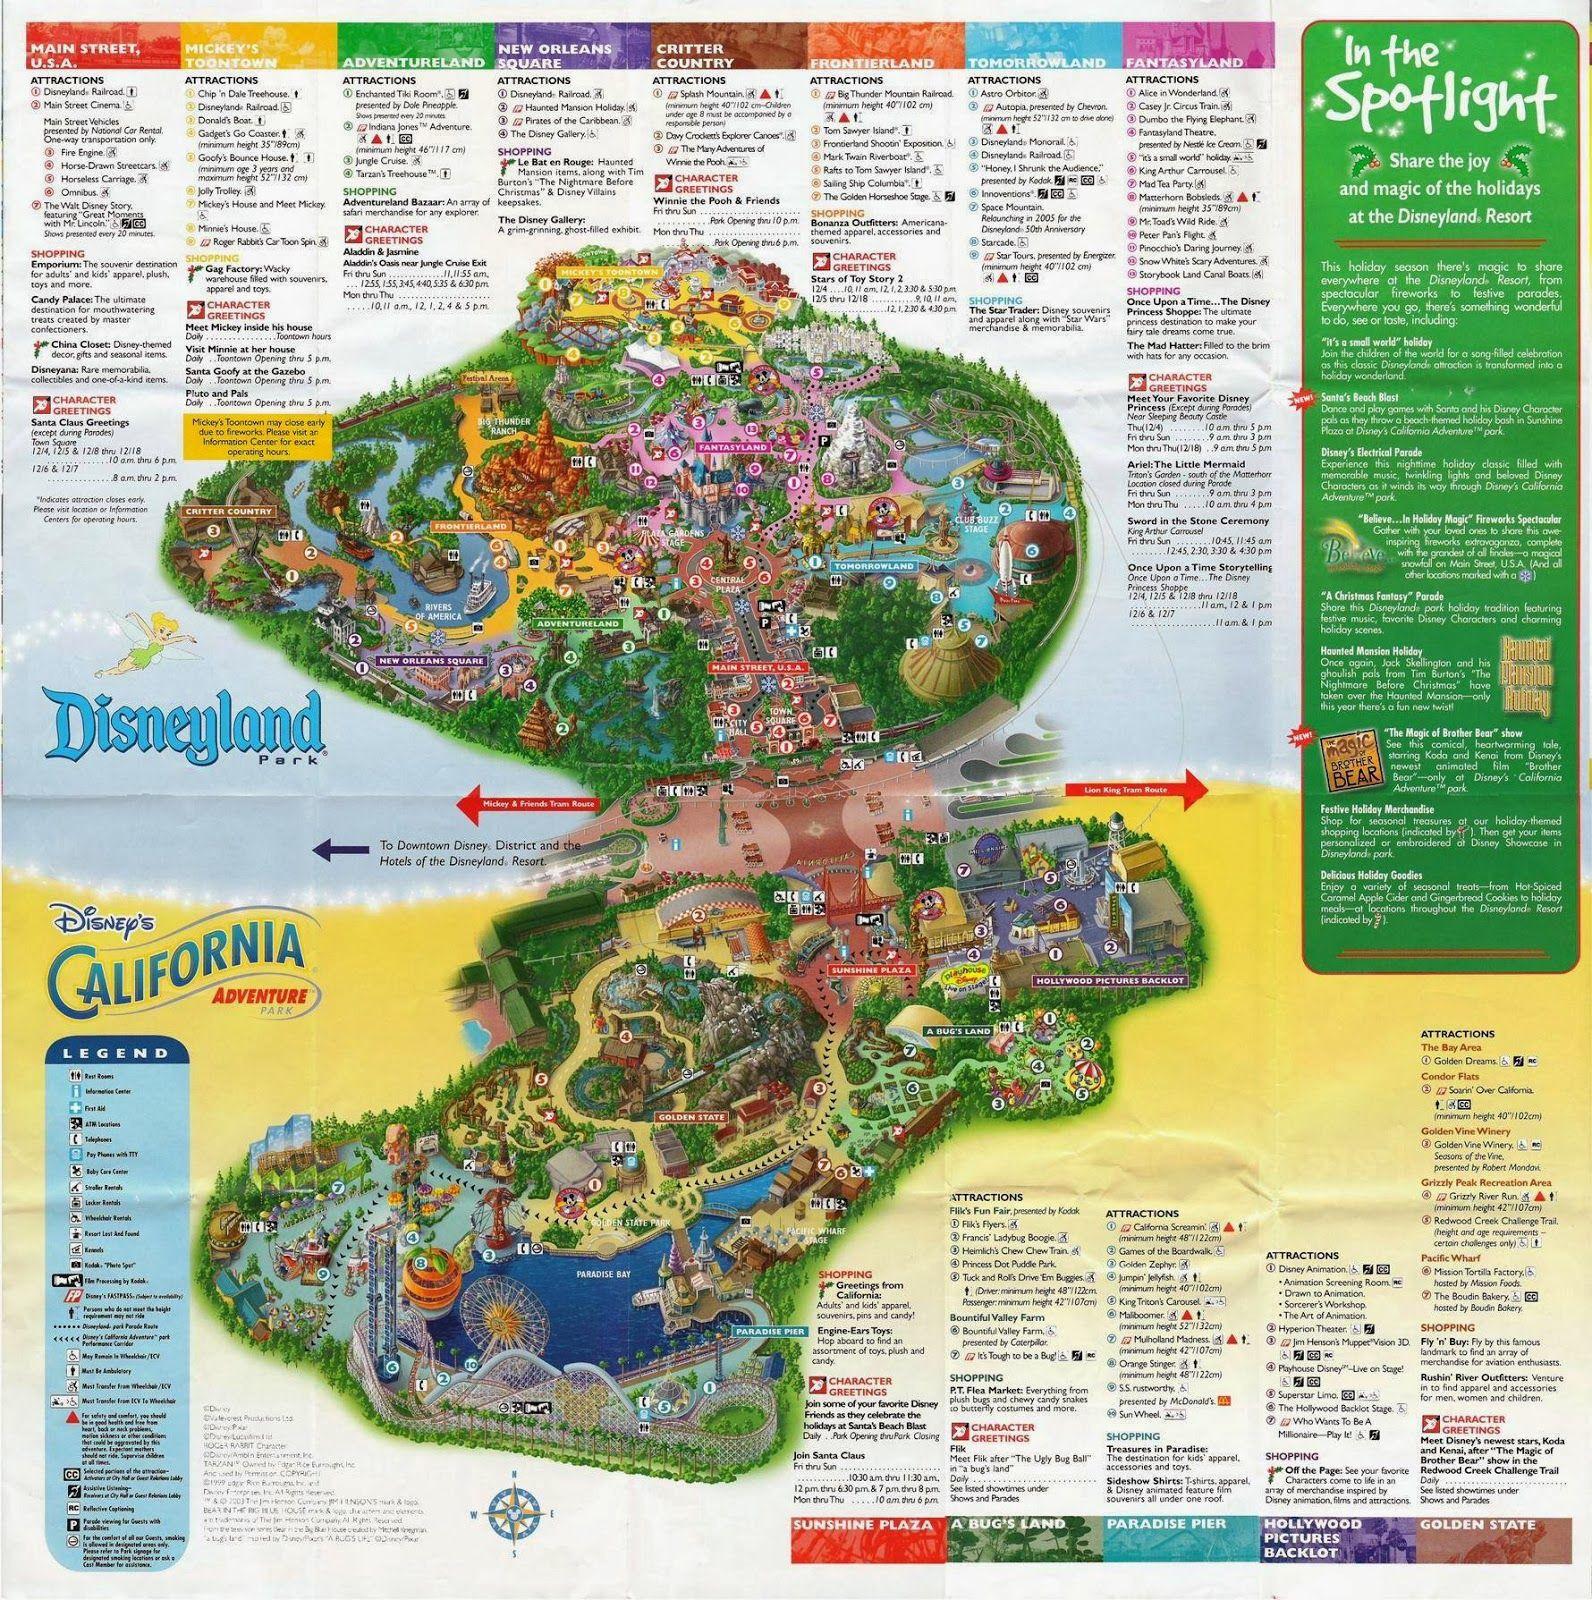 Disneyland California Adventure Map Fresh California Attractions Map - Disneyland California Map